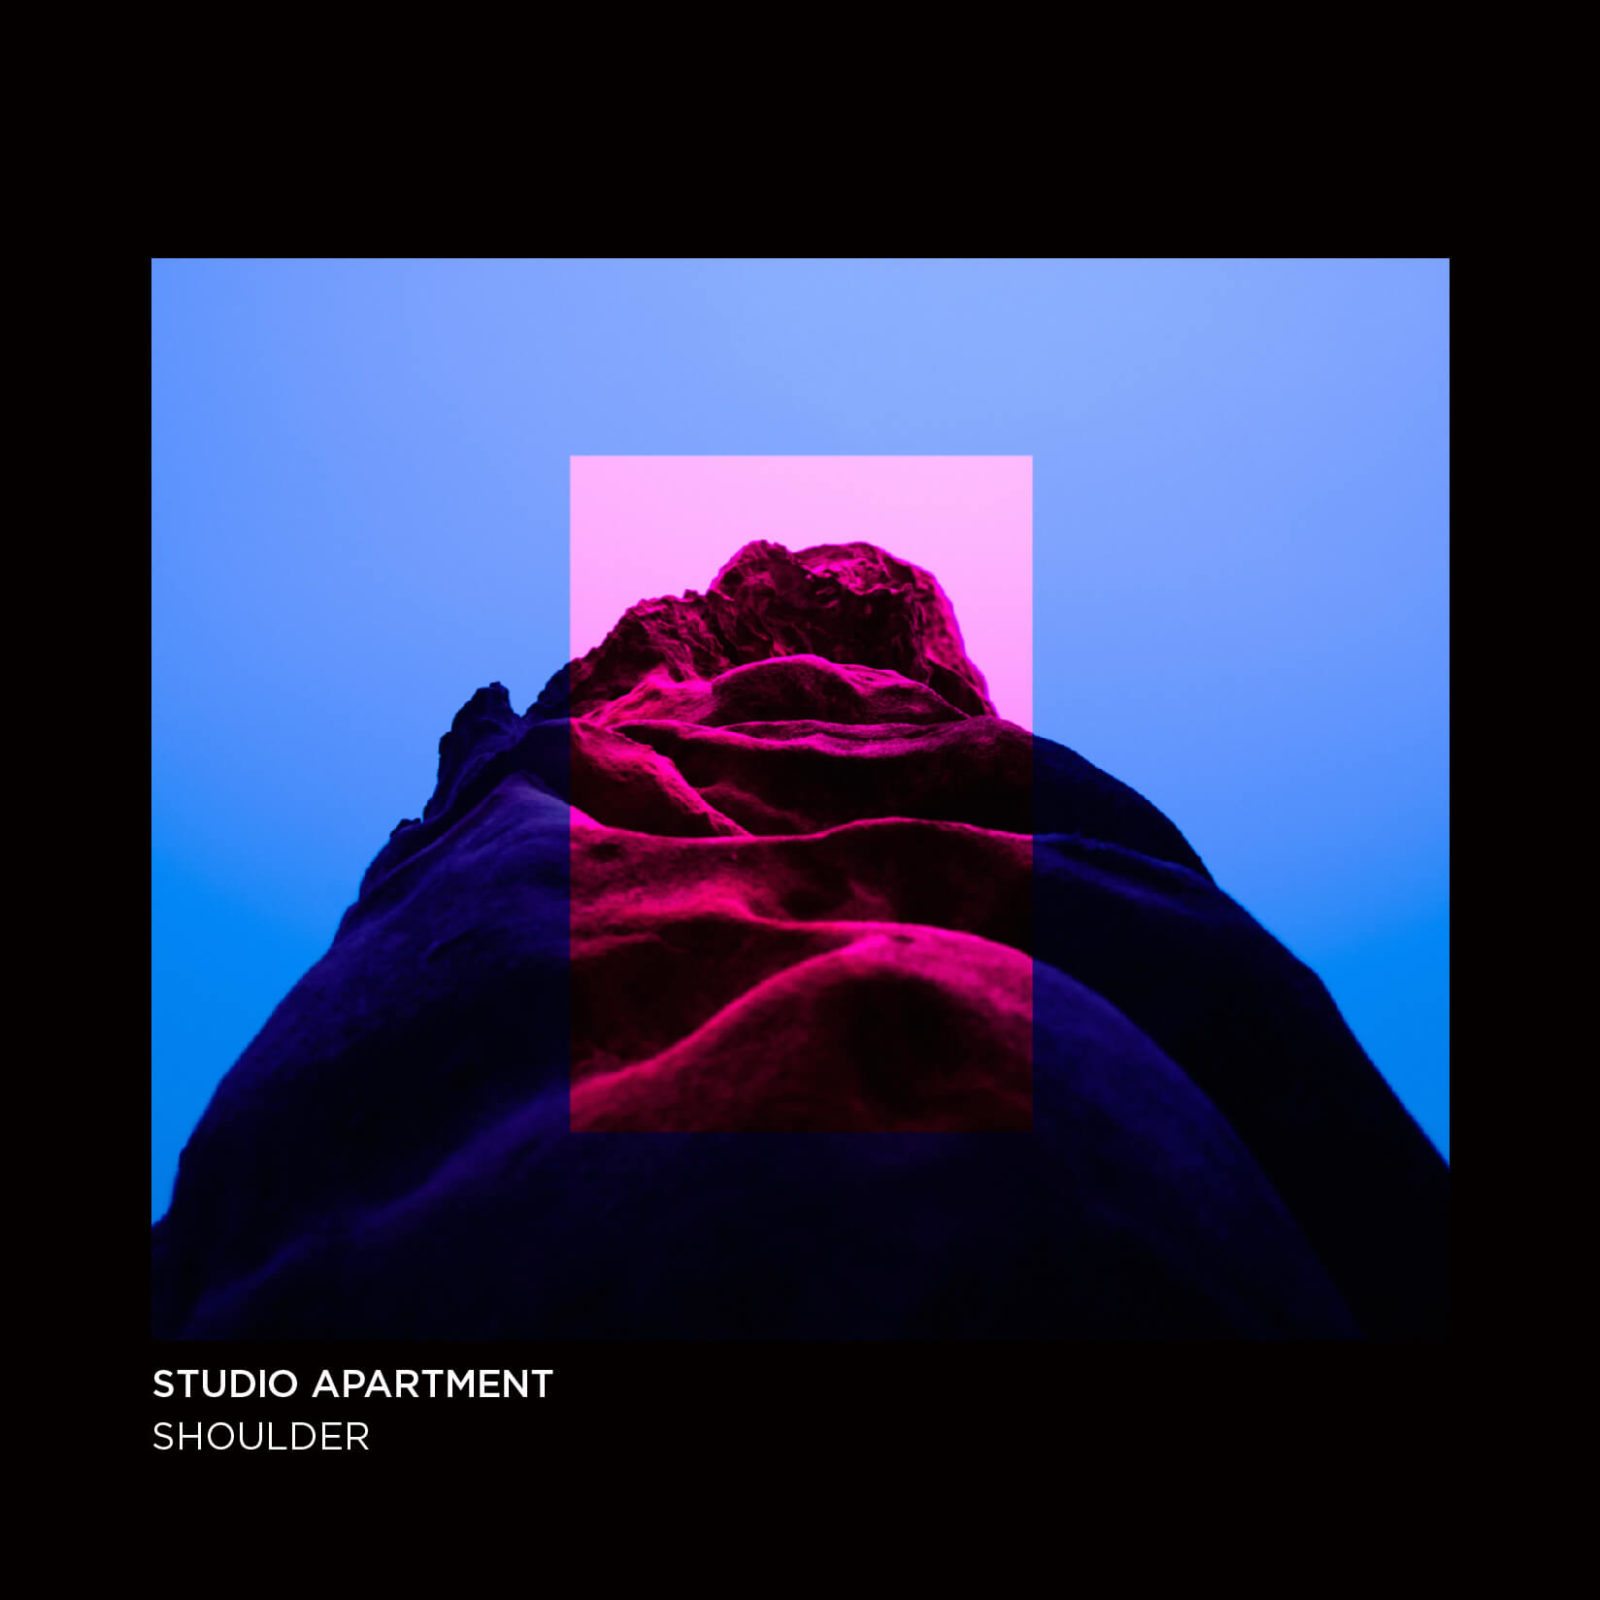 STUDIO APARTMENT、6年半ぶりとなる新曲 『Shoulder』MV SPOT公開&過去アルバム収録曲の期間限定無料配信が決定サムネイル画像